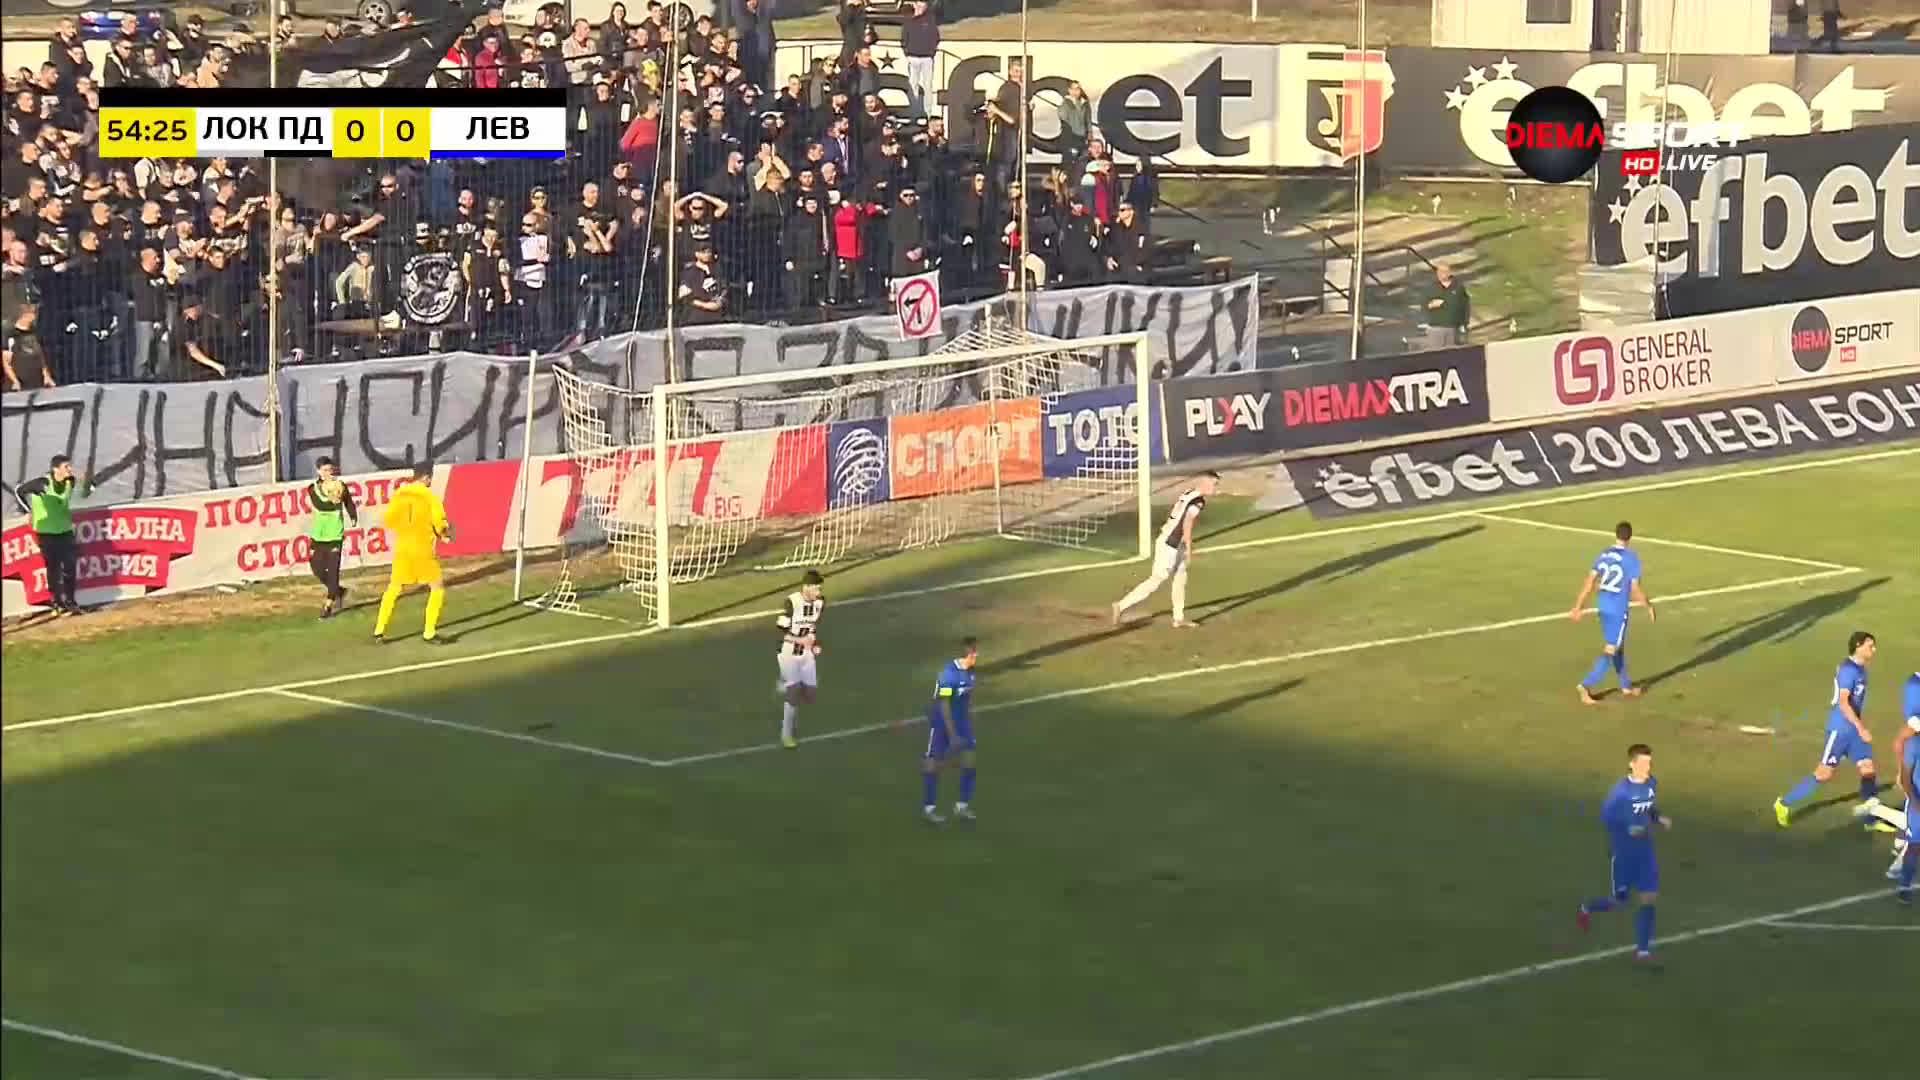 Локомотив Пд - Левски 0:0 /репортаж/